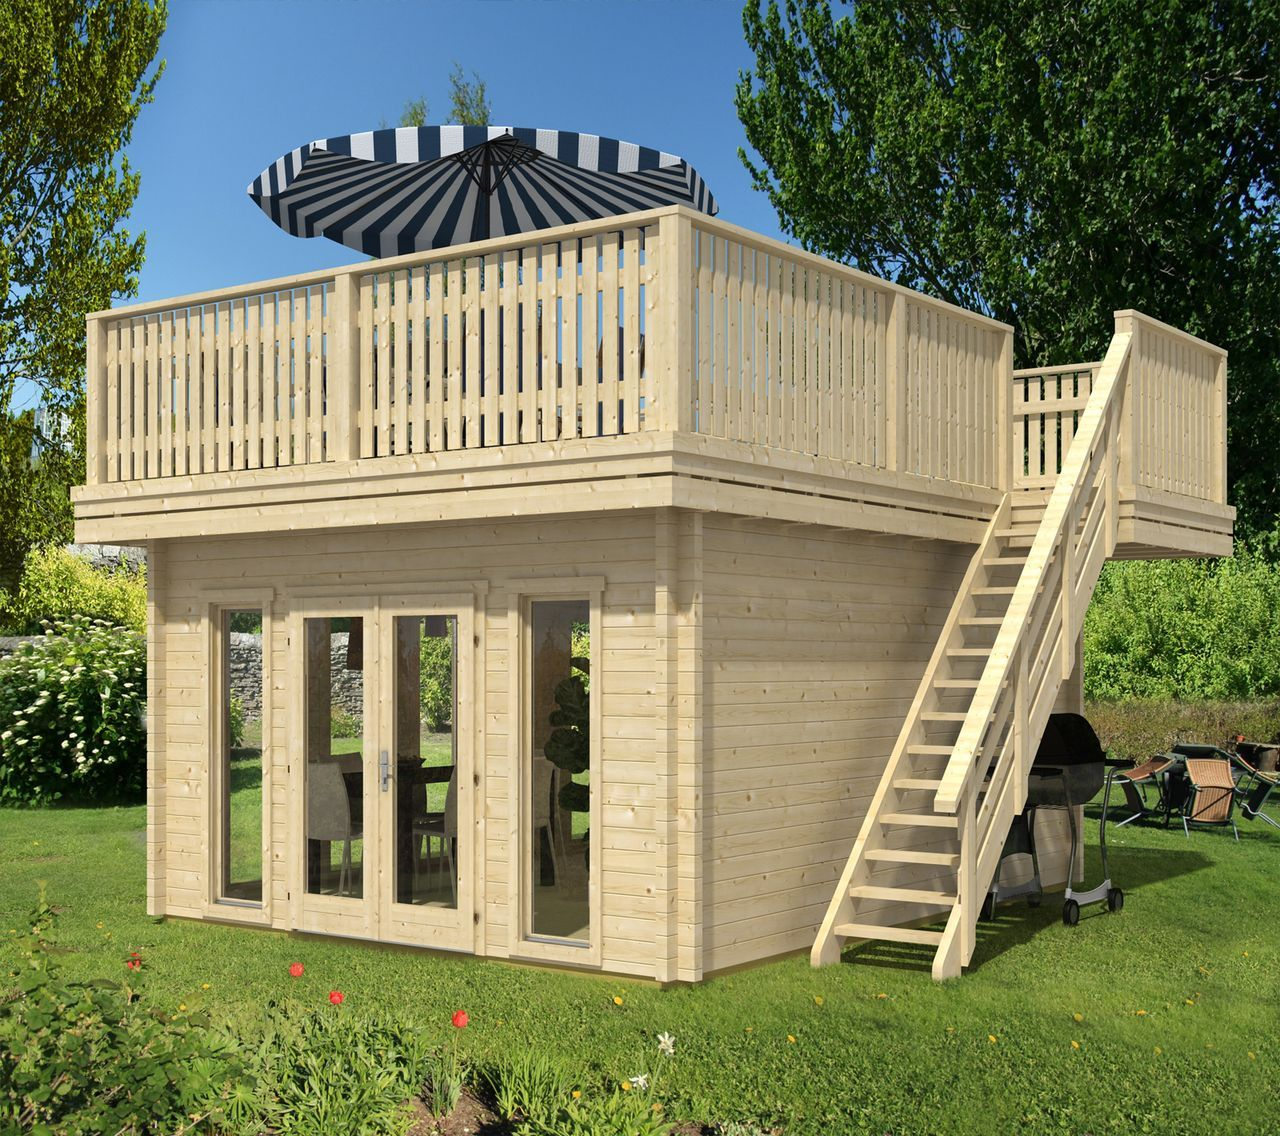 Terrassendachhaus70 Gartenhaus selber bauen, Gartenhaus